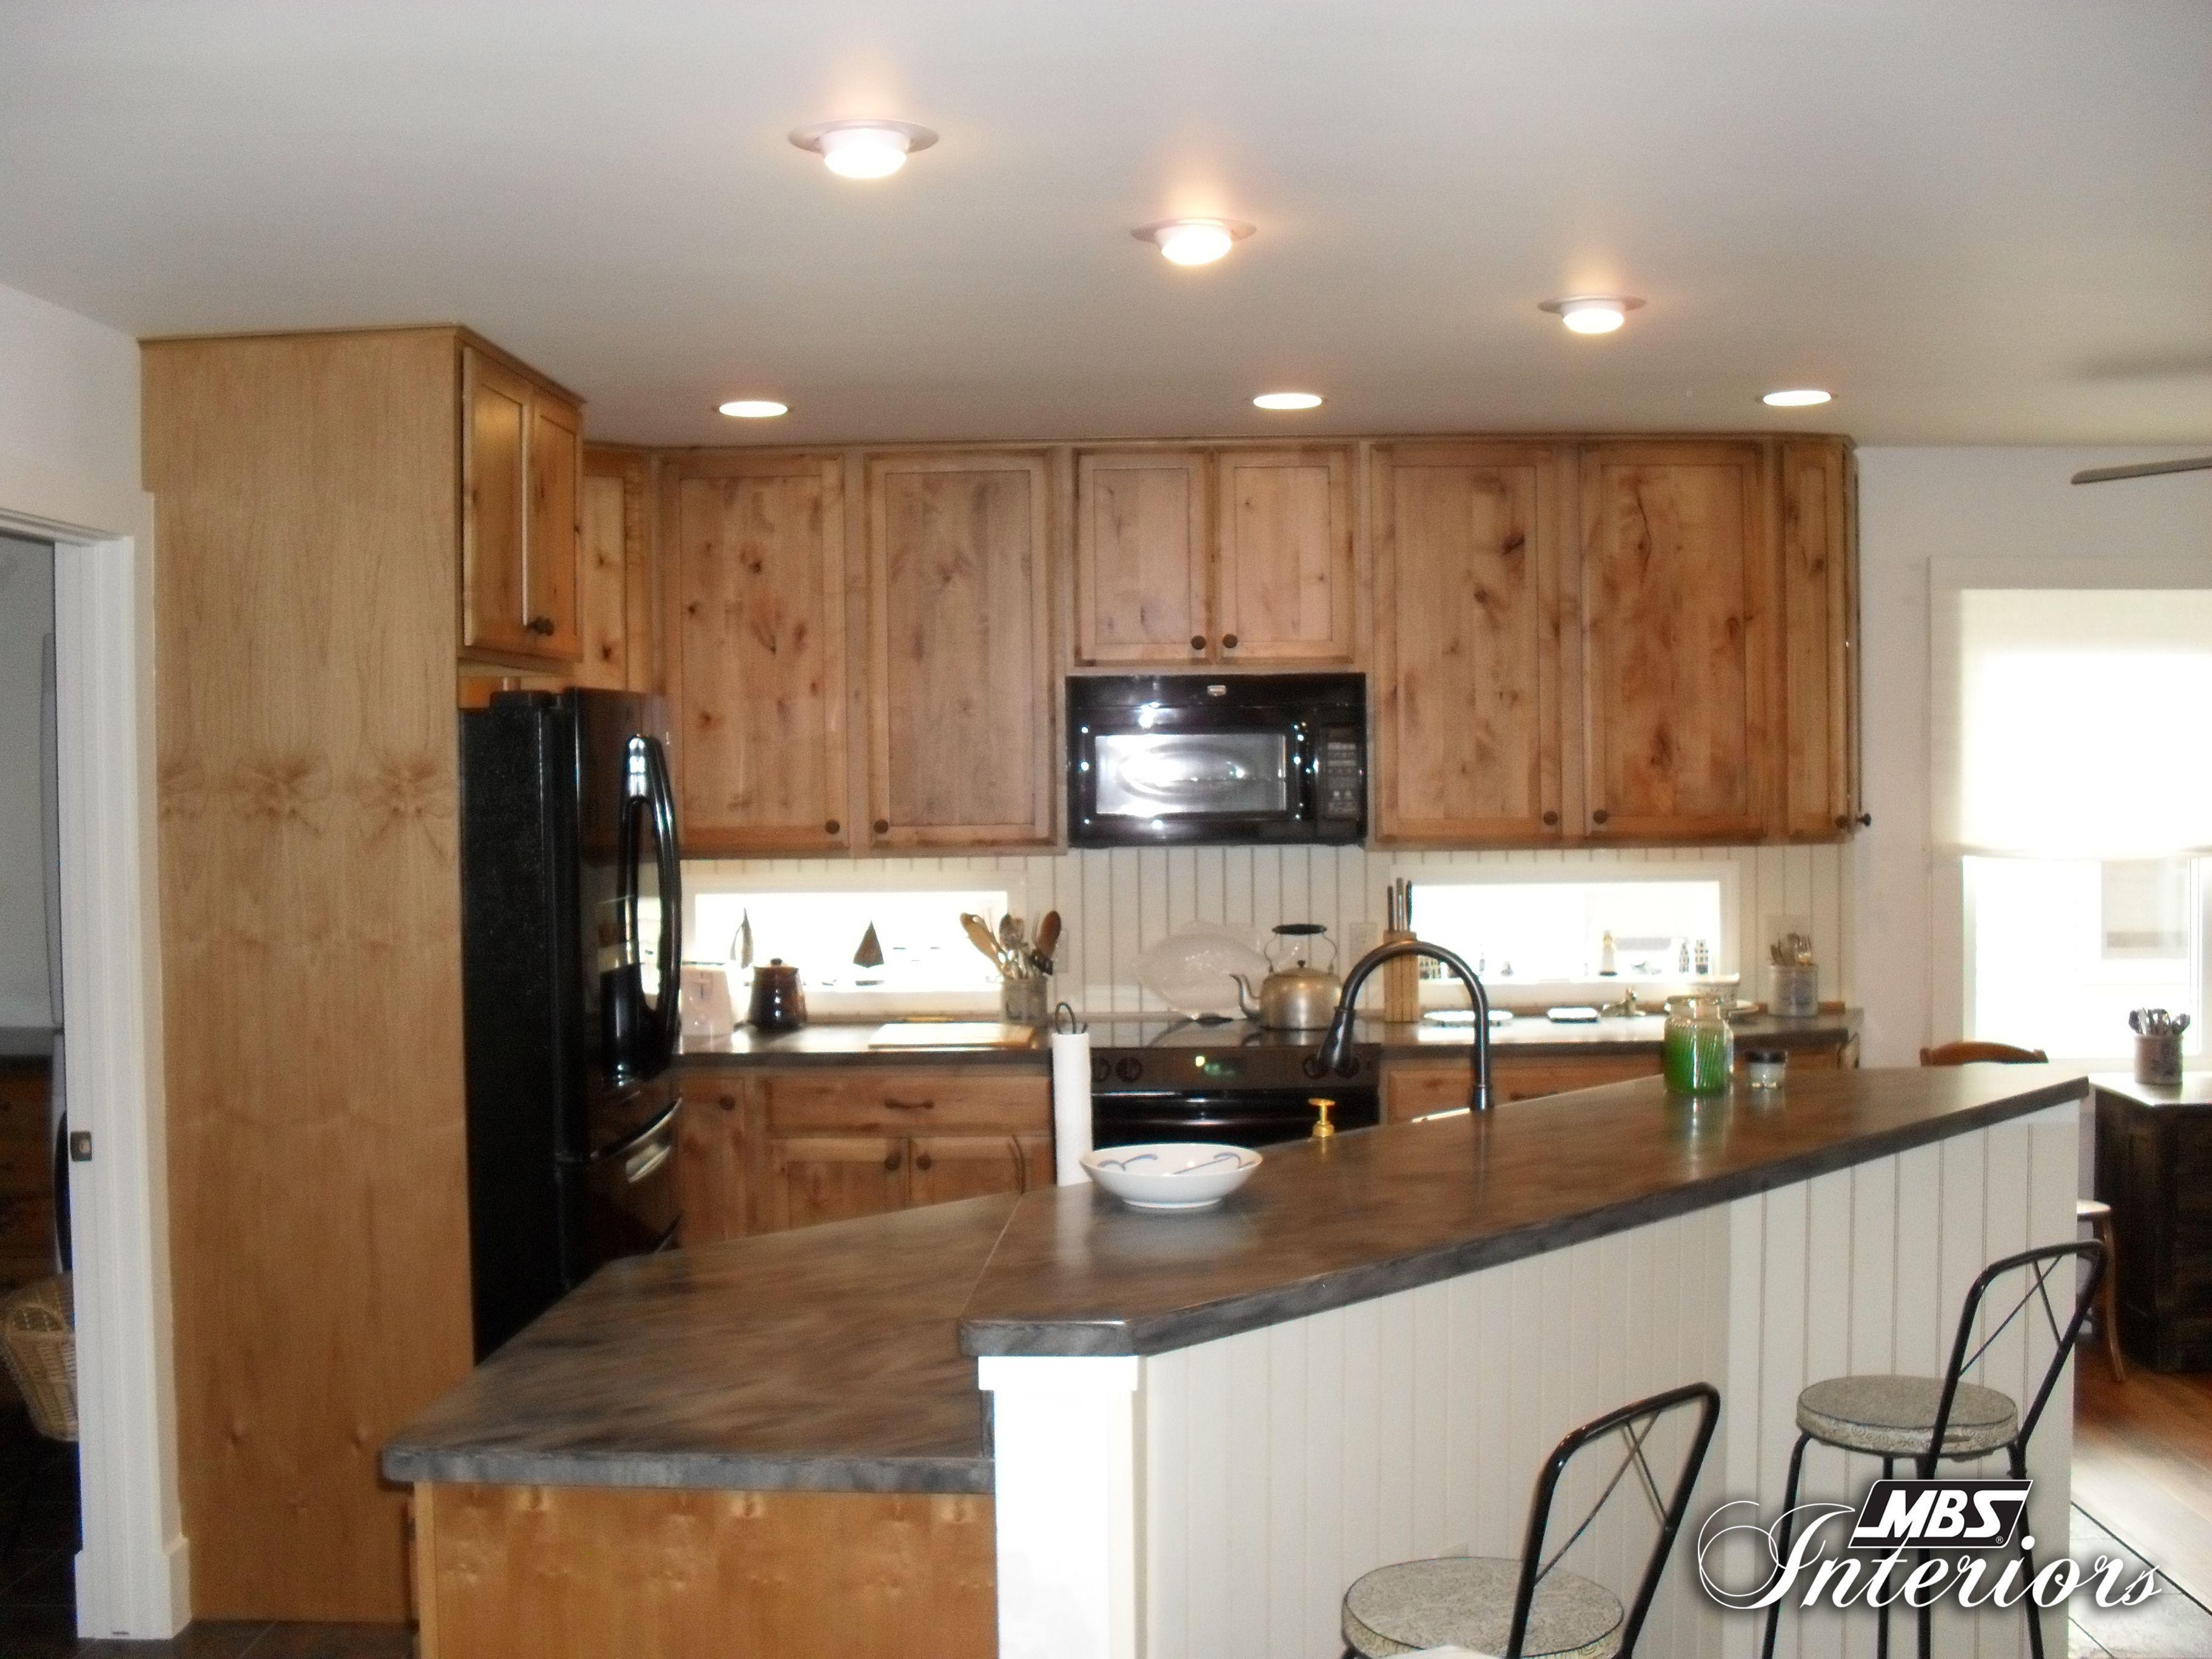 Perimeter StarMark Cabinetry Arlington door style in Cherry